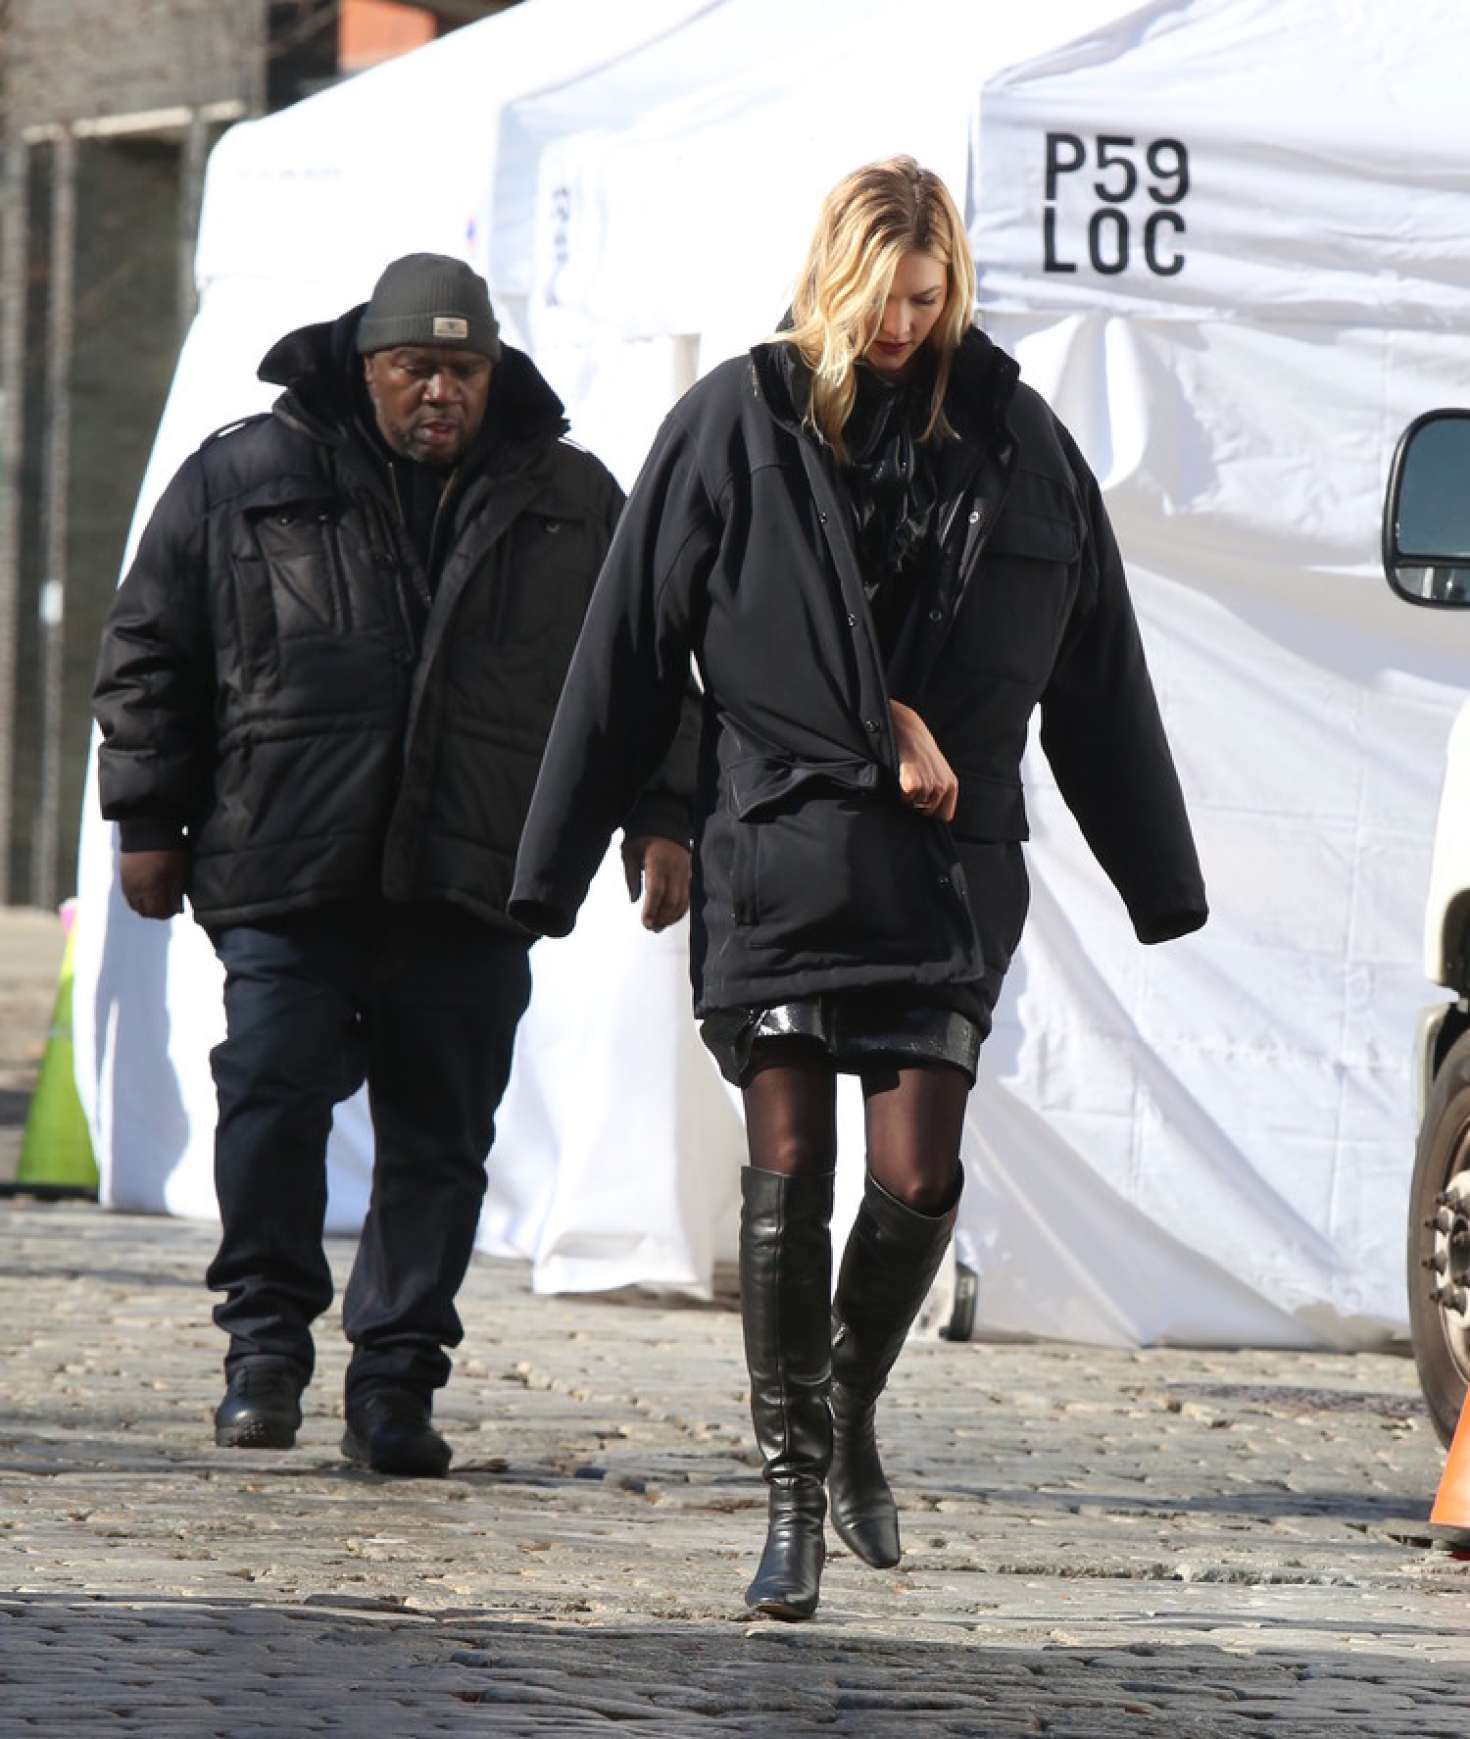 Karlie Kloss 2018 : Karlie Kloss at a photoshoot in New York City -08